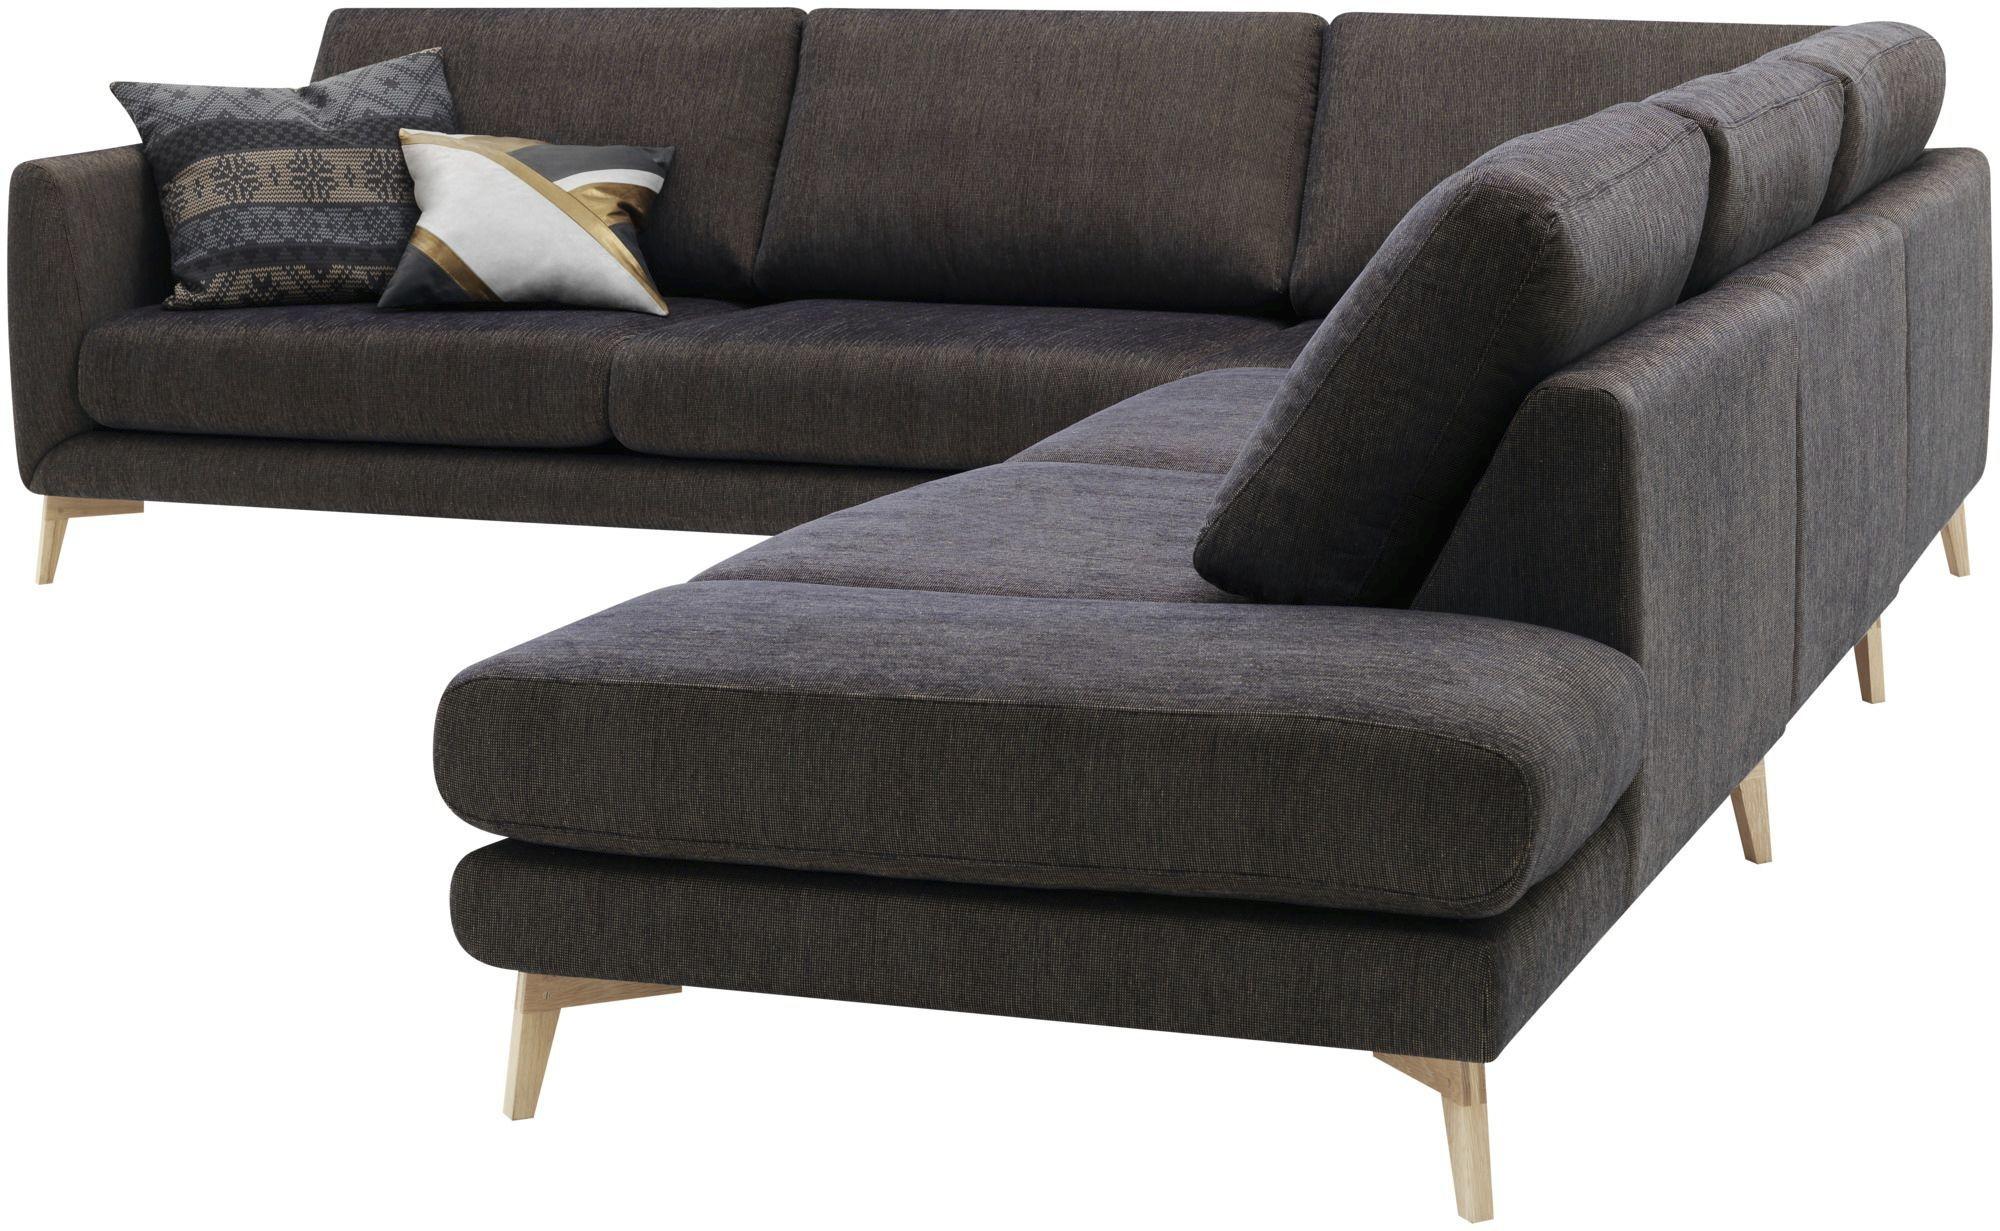 Corner Sofa Modular Contemporary Leather Fargo Anders Regarding Modular Corner Sofas (Image 6 of 15)